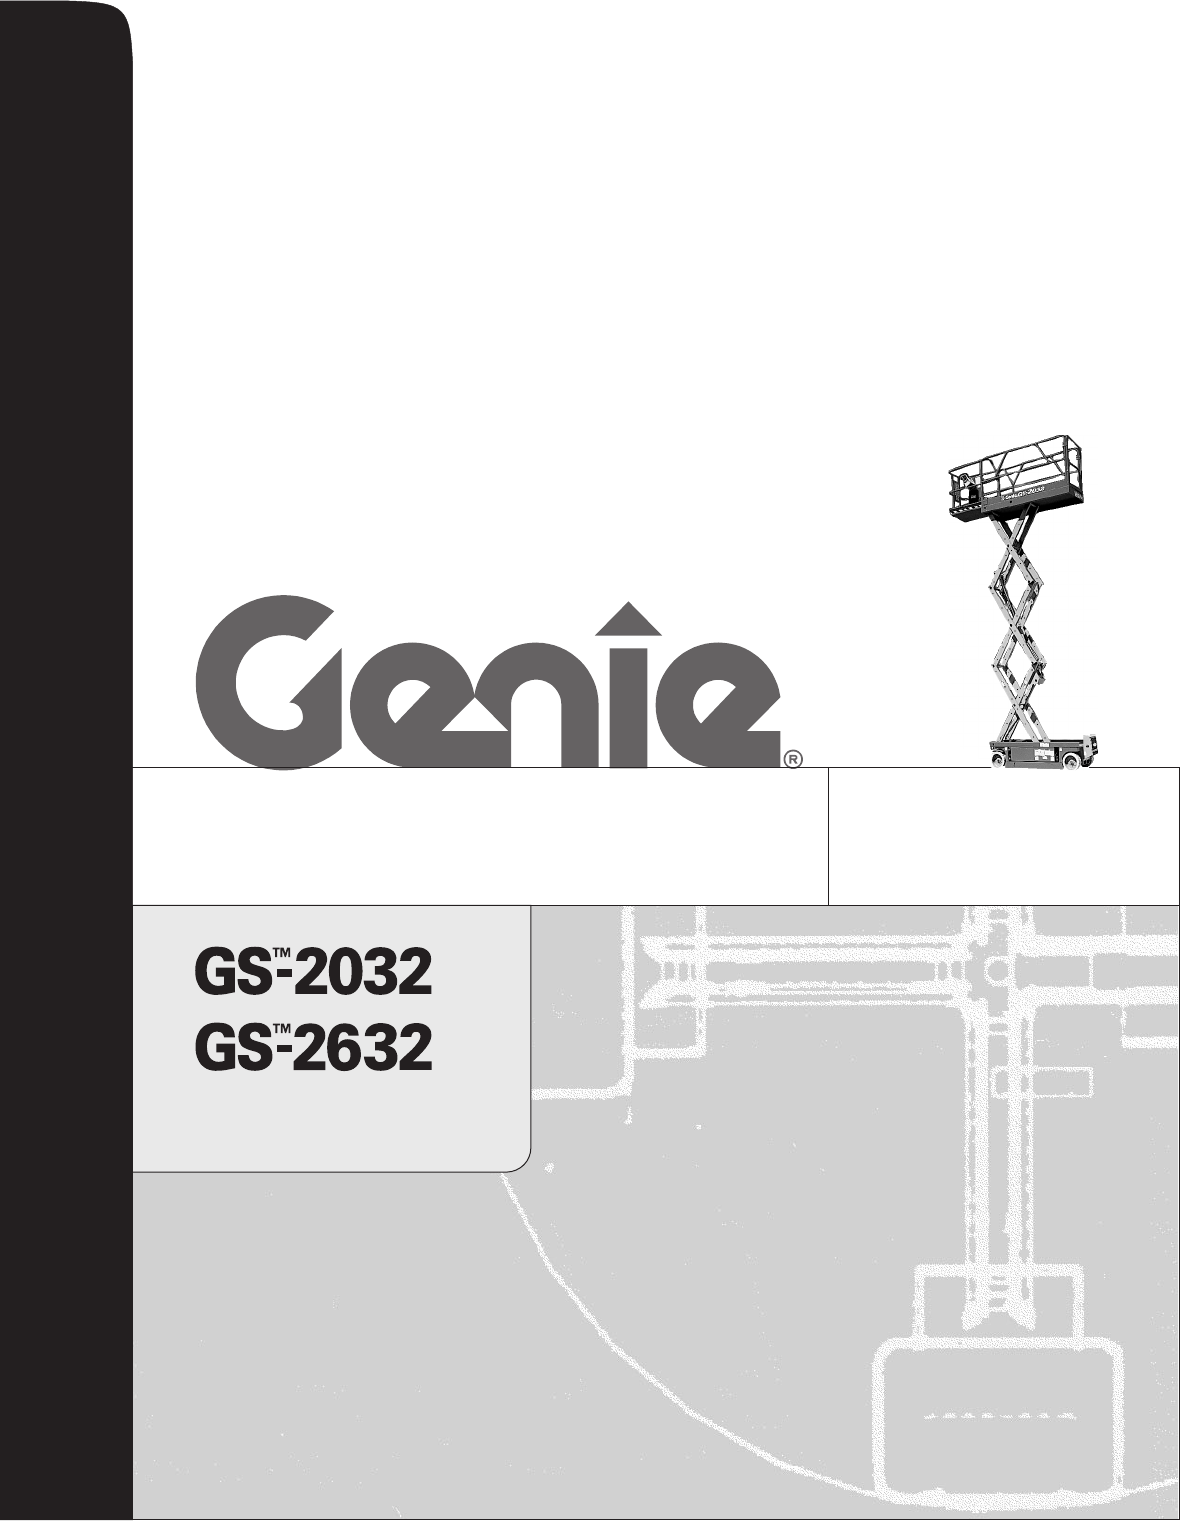 Genie Scissor Lift User Manual Wiring Diagram Durante Rentals Construction Equipment Blog Safety Rh Duranterentals Blogspot Com Jlg Boom